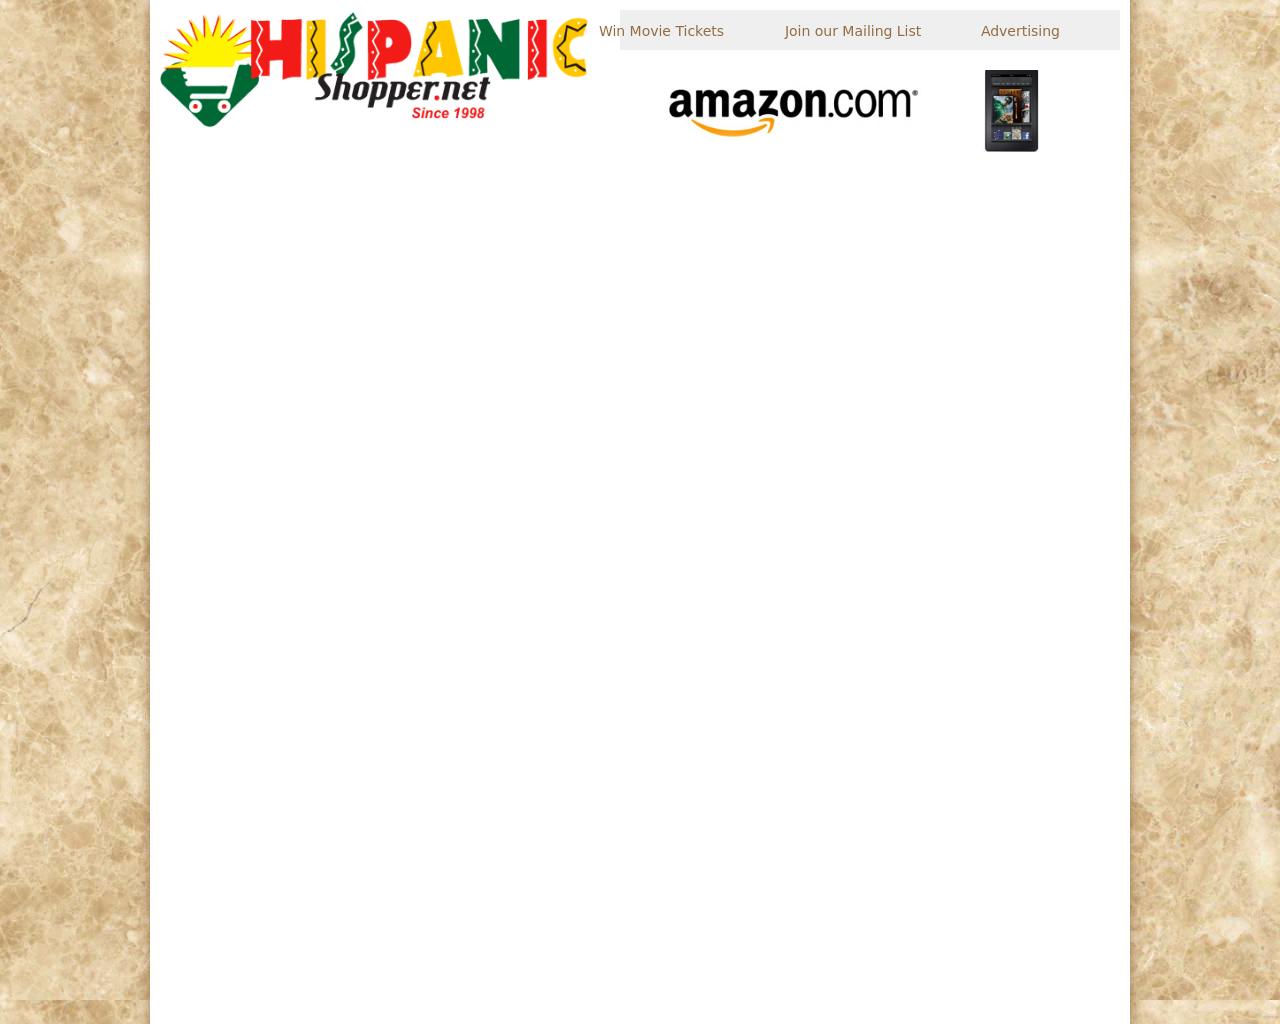 HispanicShopper.net-Advertising-Reviews-Pricing